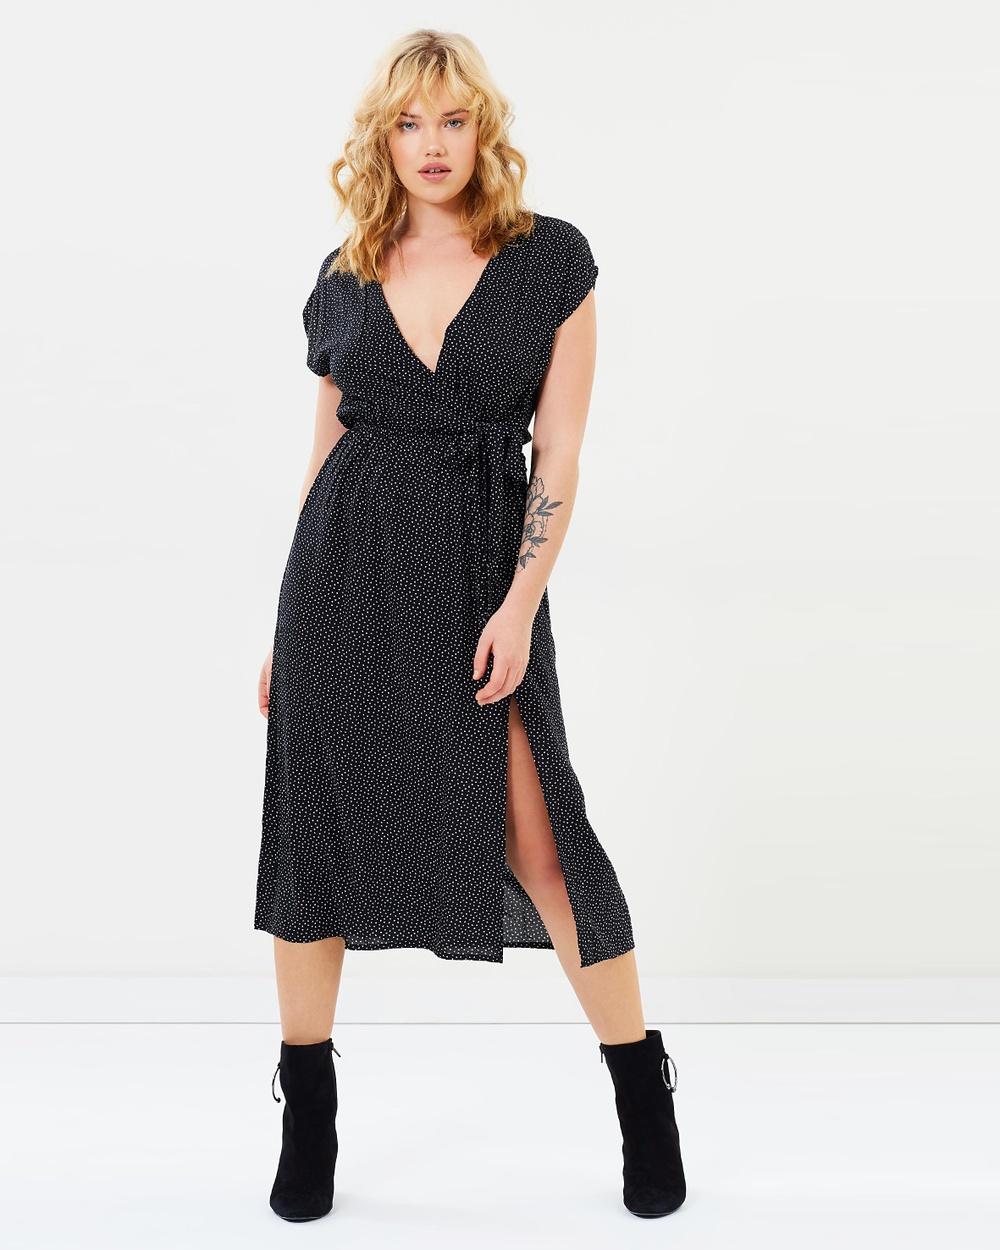 MINKPINK Jemima Wrap Dress Printed Dresses Black & White Jemima Wrap Dress